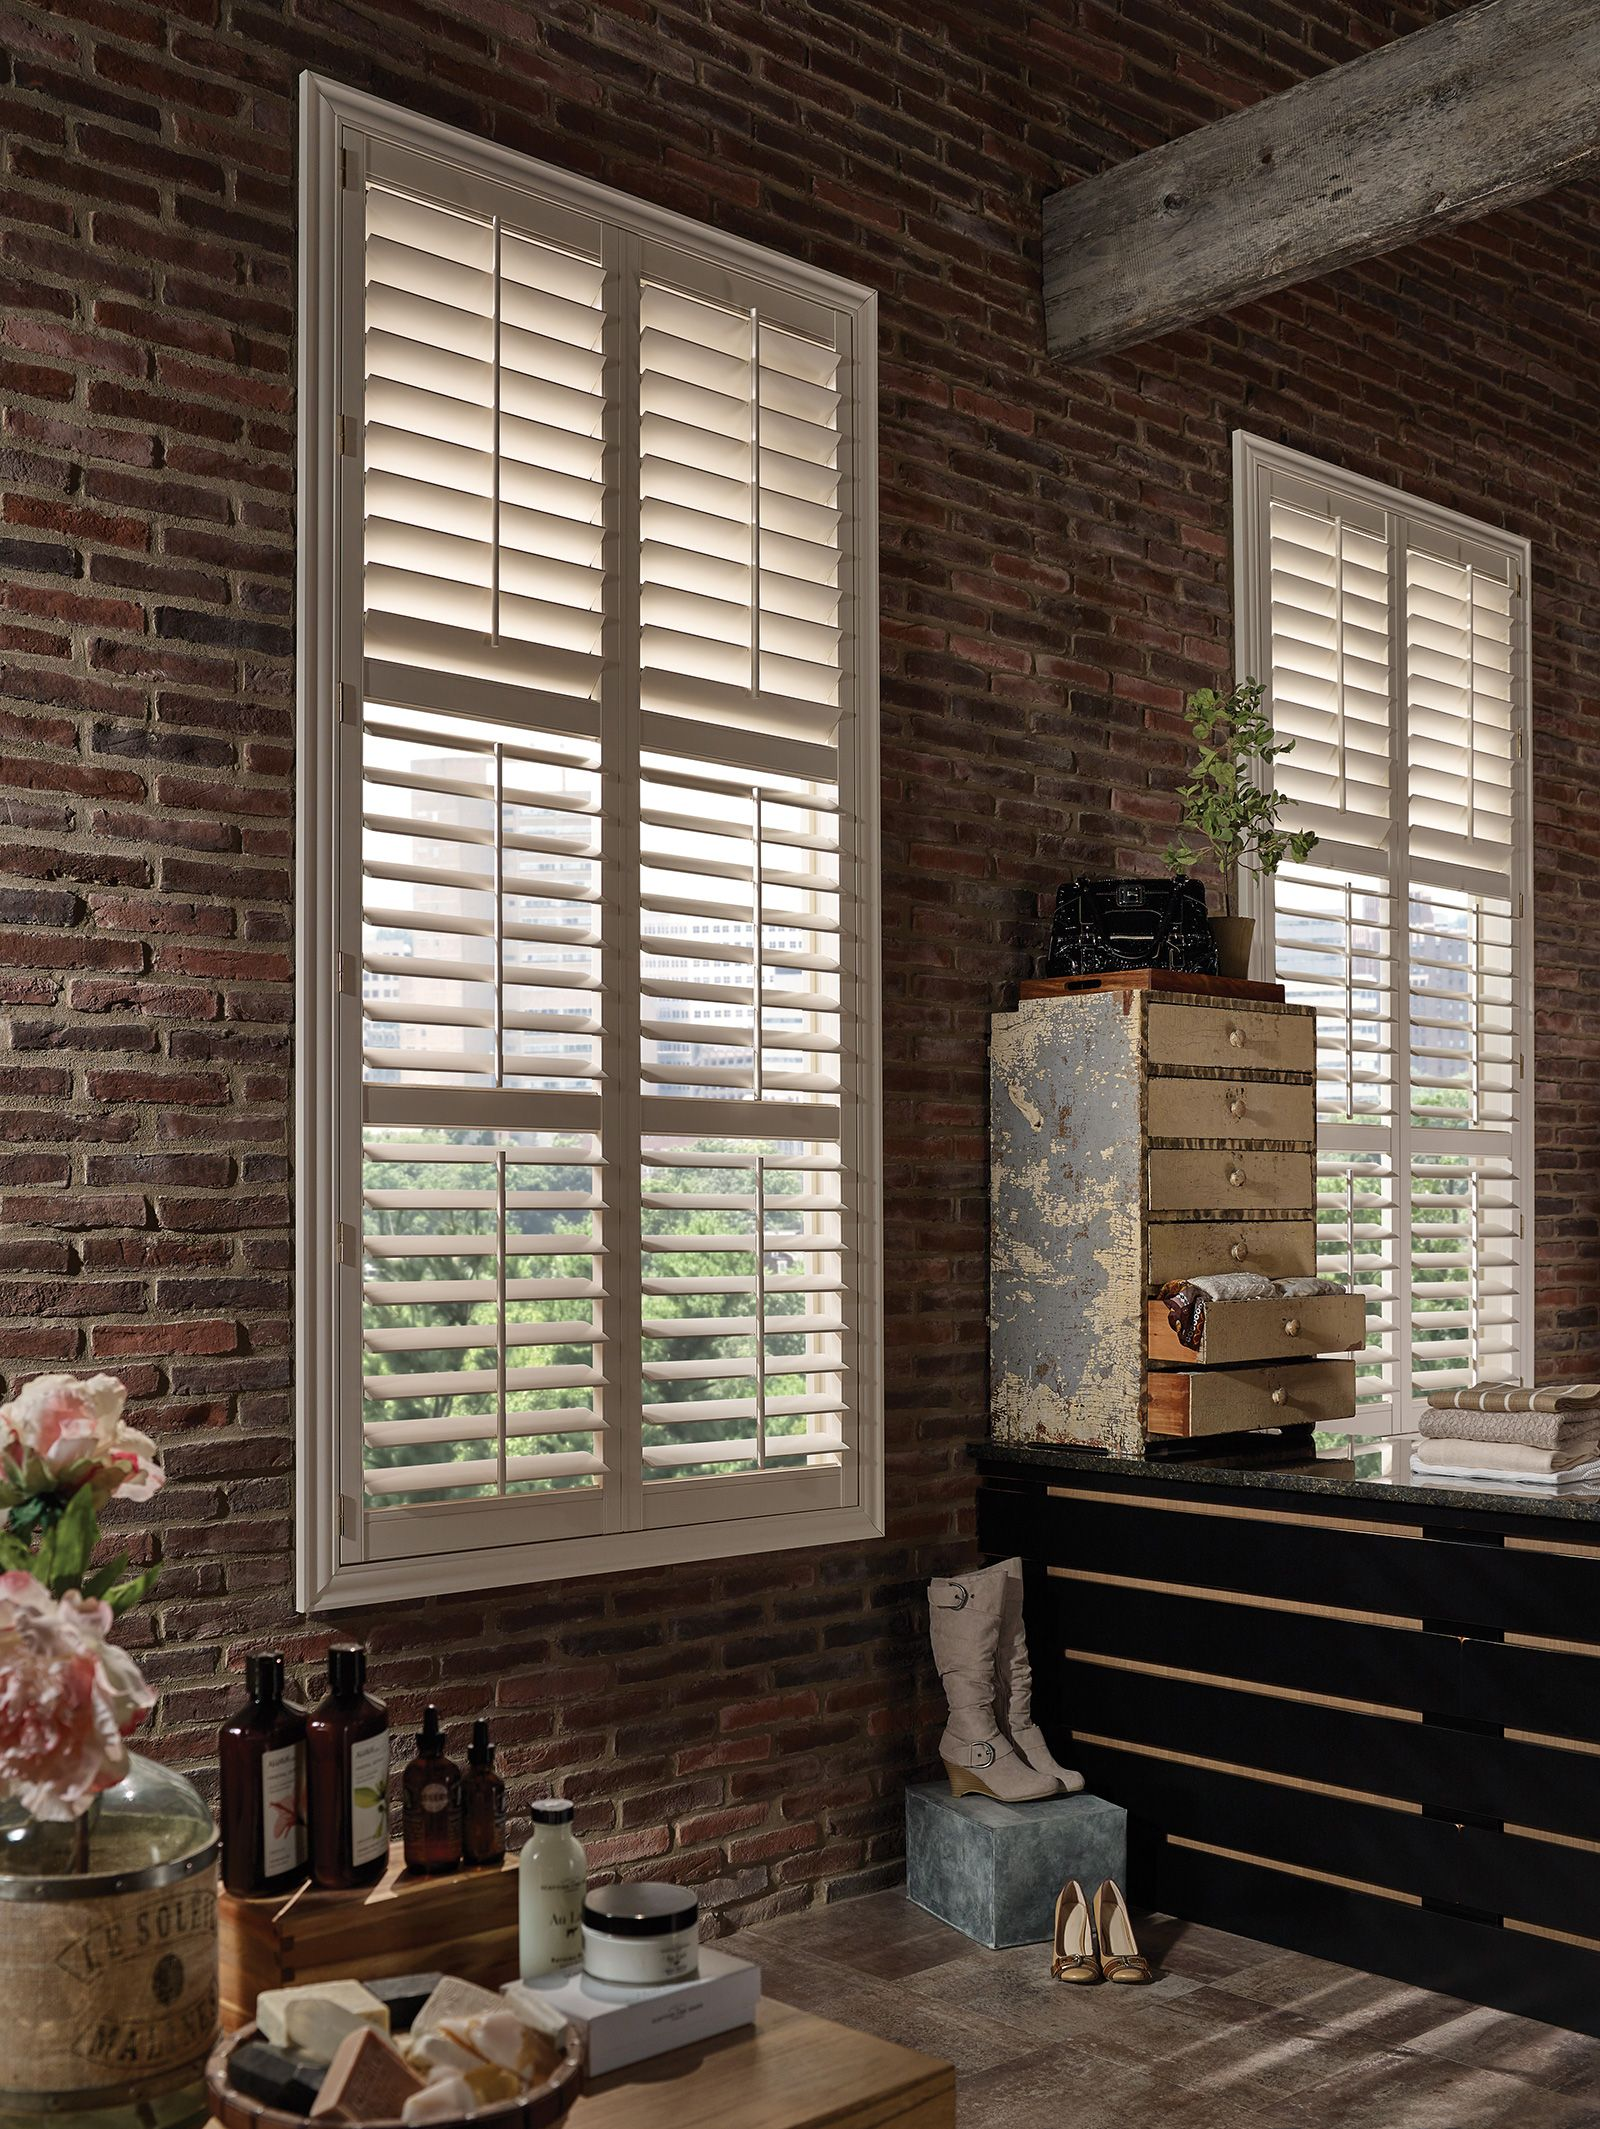 Vanilla - 3 1/2 inch louver - Deluxe Trim Frame - Two Standard Divider Rails - Tilt Bar